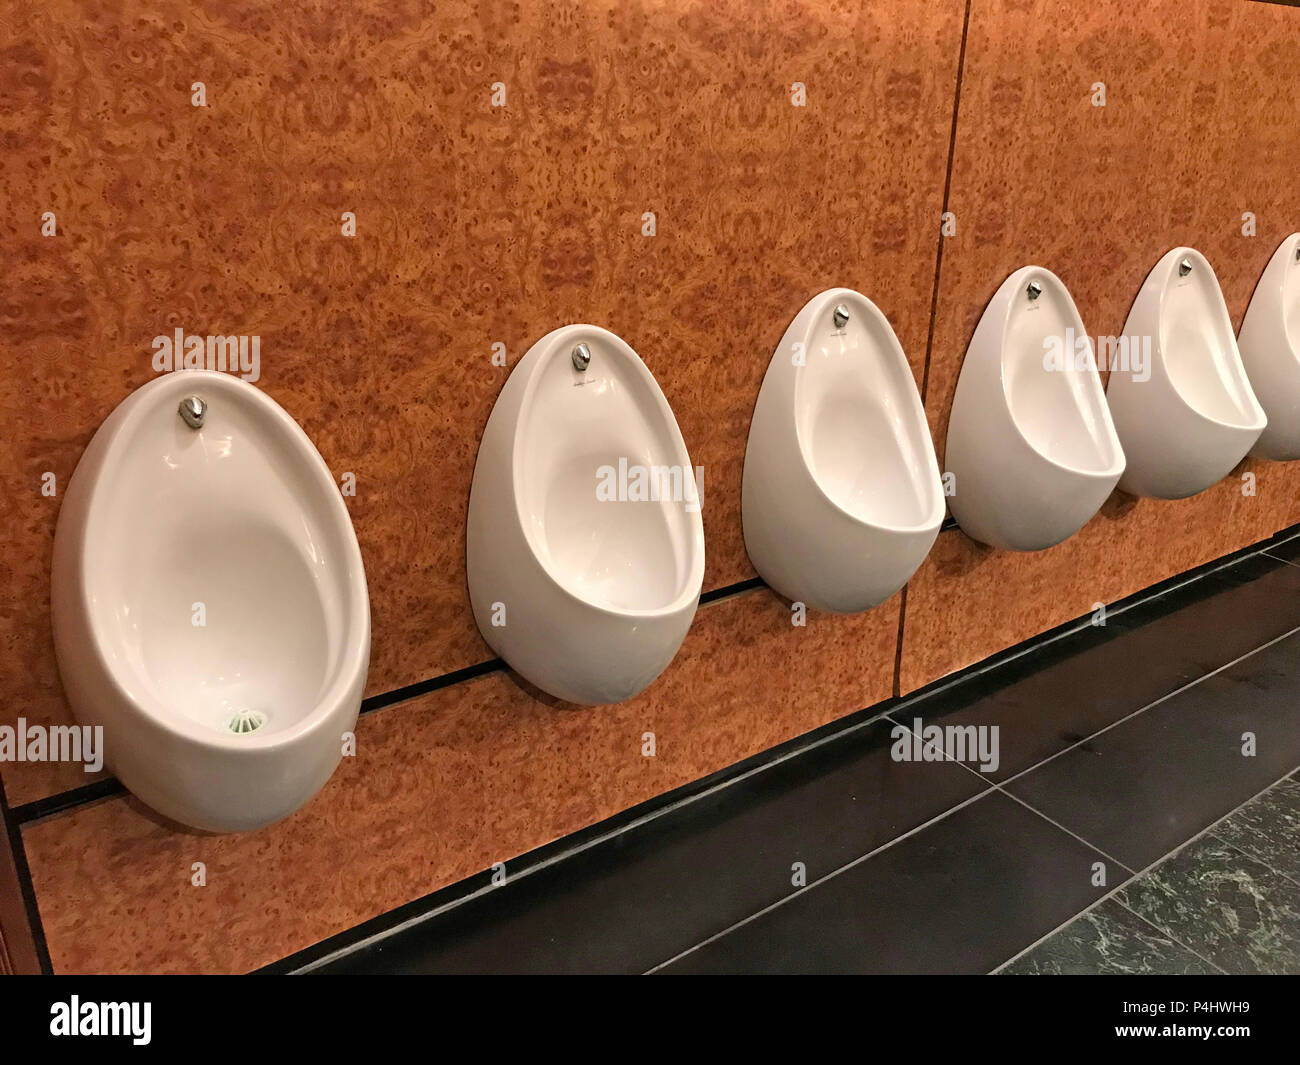 GoTonySmith,@HotpixUK,toilet,toilets,urinals,WC,line,of,leeds,fixture,for,pisspot,piss,pissing,waterless,water-less,sensor-operated,sensor